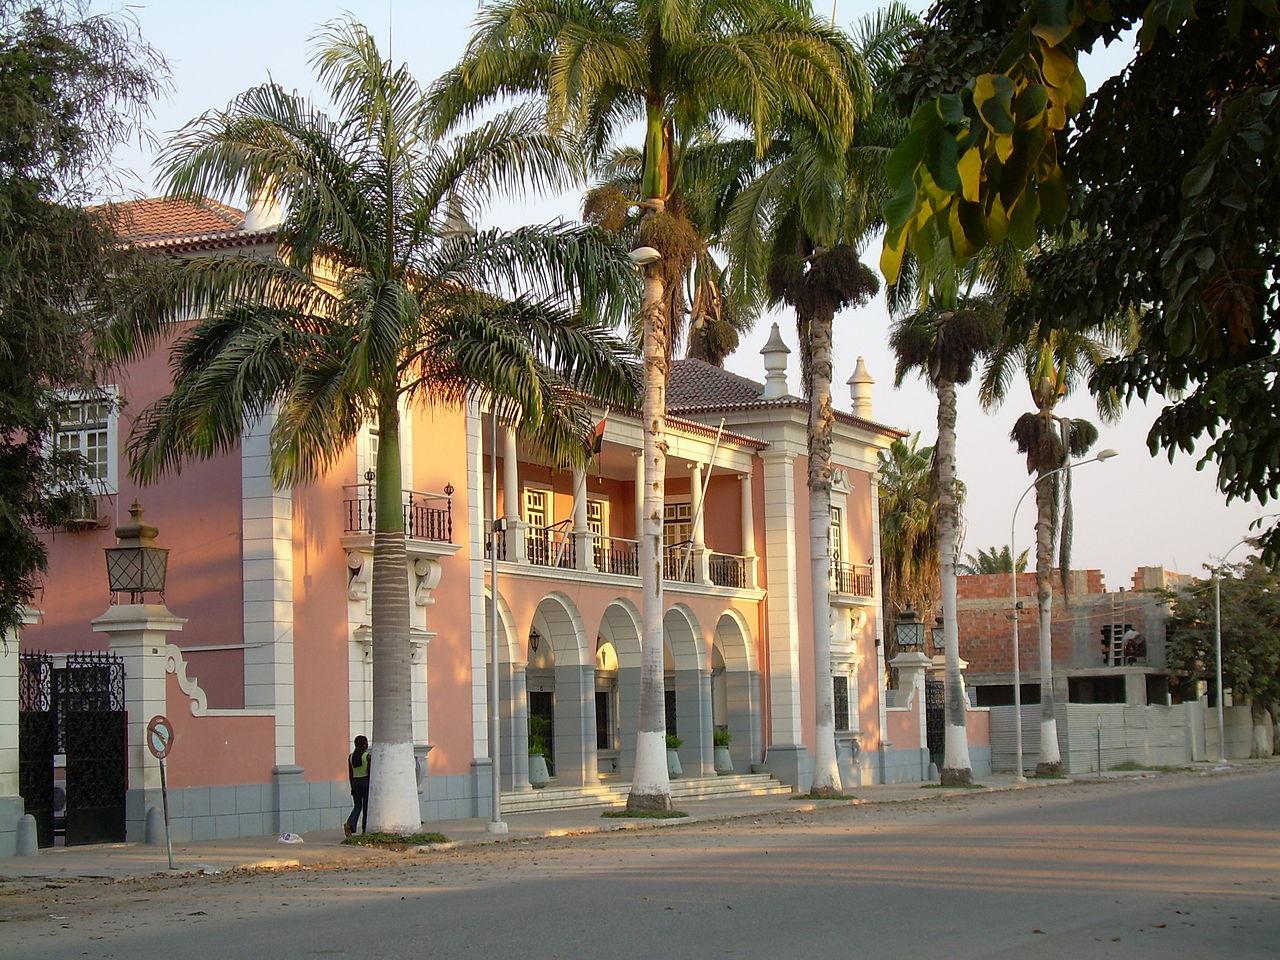 Benguela, Angola, image by F H Mira via Creative Commons